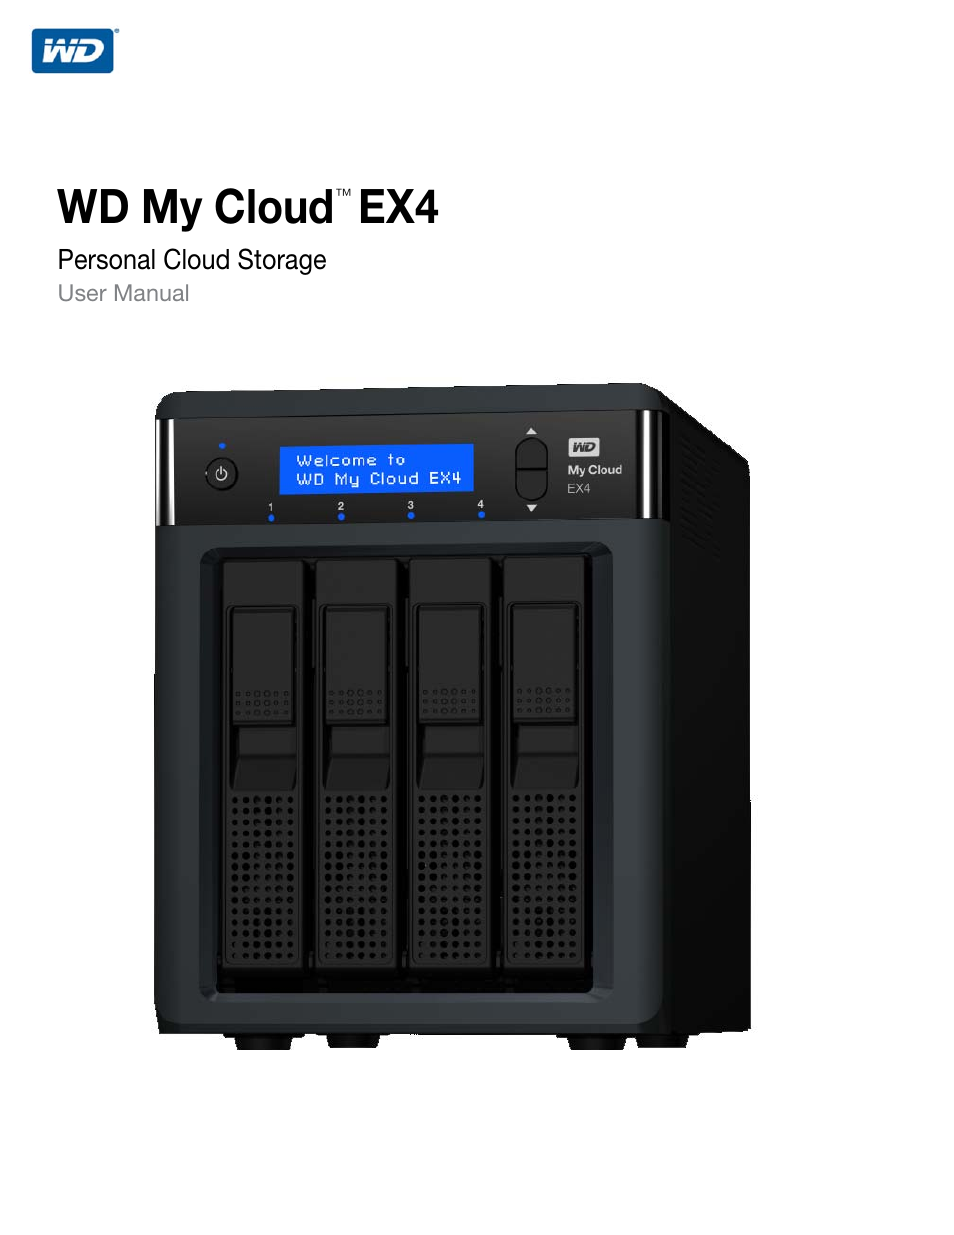 Western Digital My Cloud EX4 User Manual User Manual | 170 pages